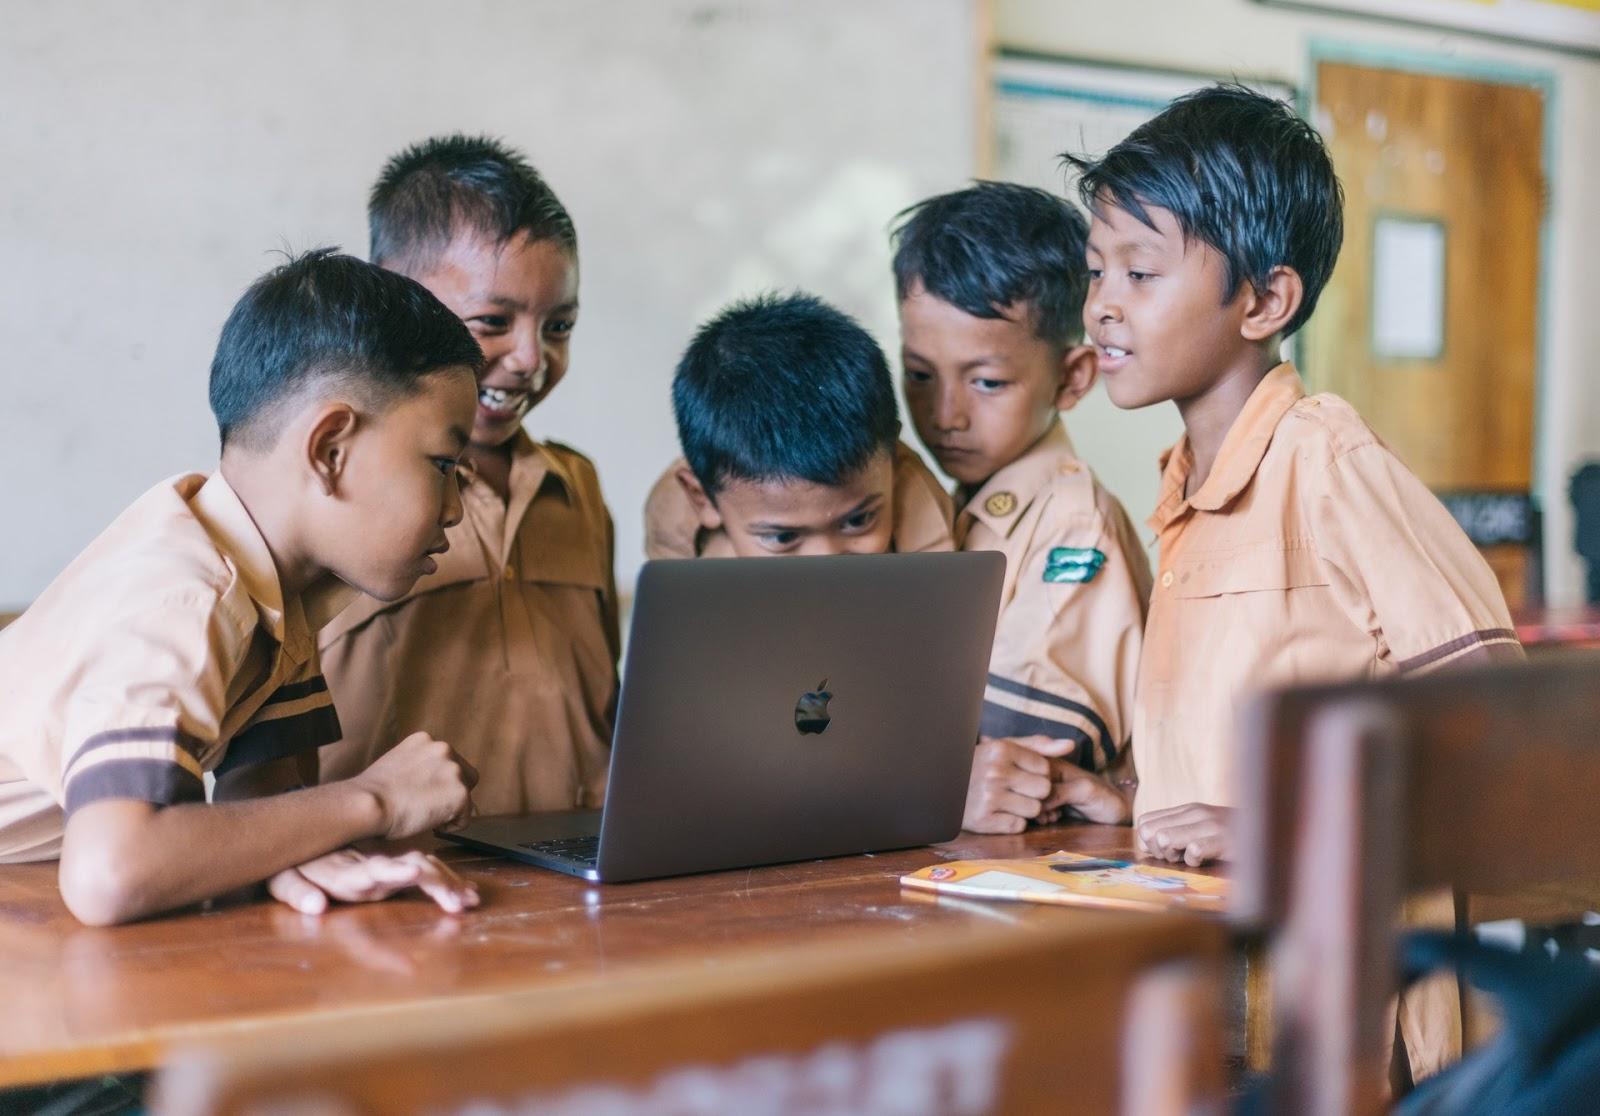 A group of five boys in school uniforms gather around a laptop in their <mark><mark><mark>classroom</mark></mark></mark>.